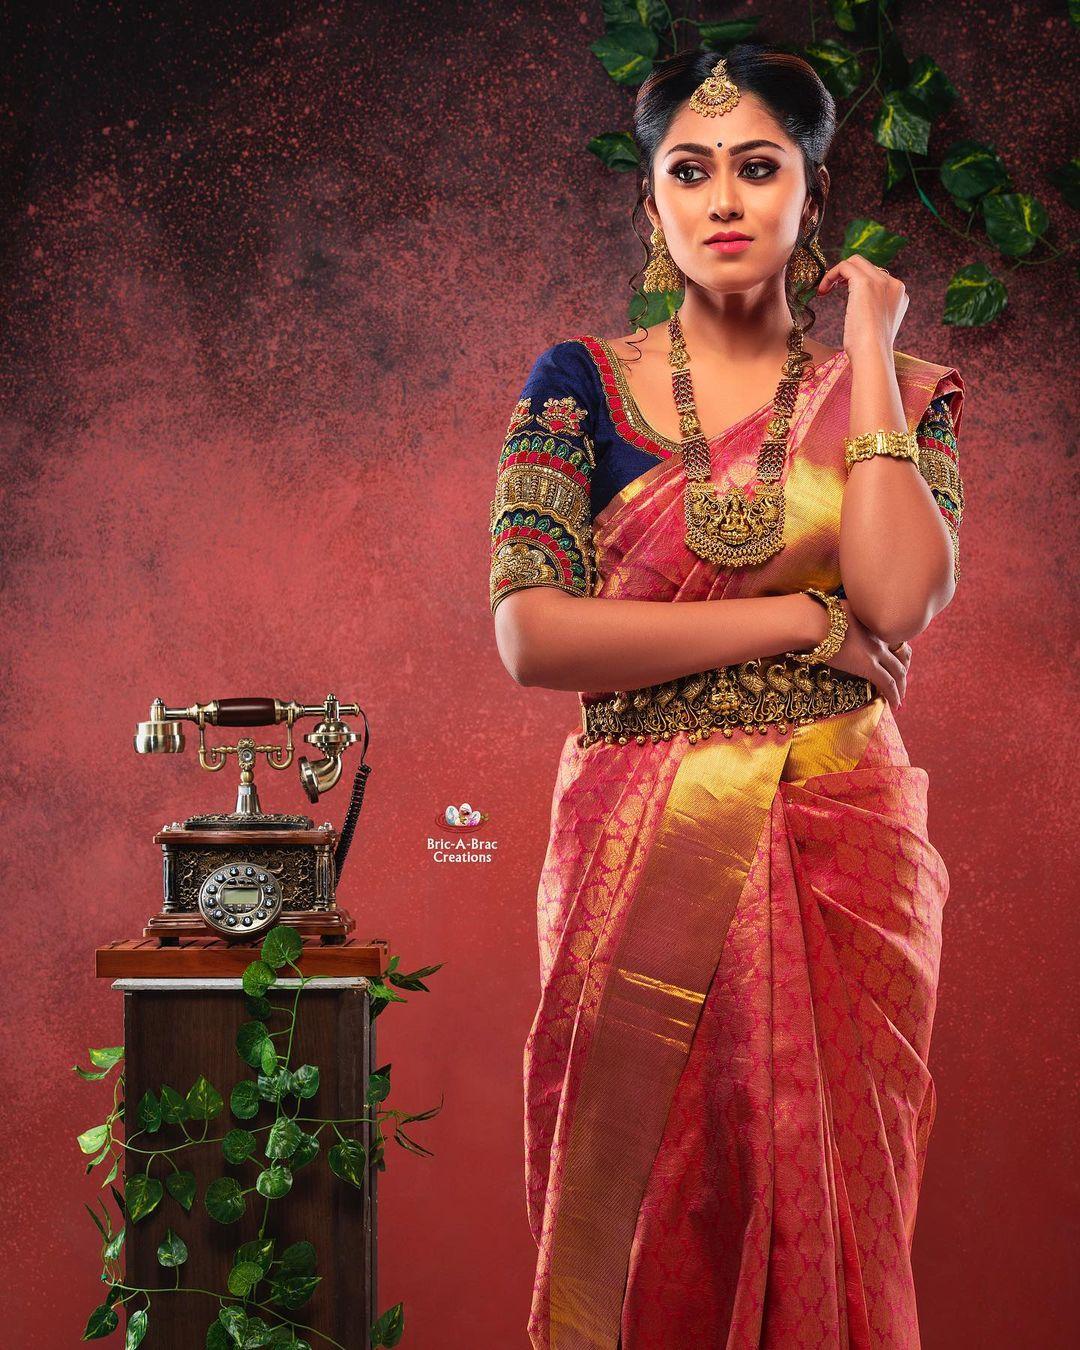 Sreethu Krishnan Photos hd (33)